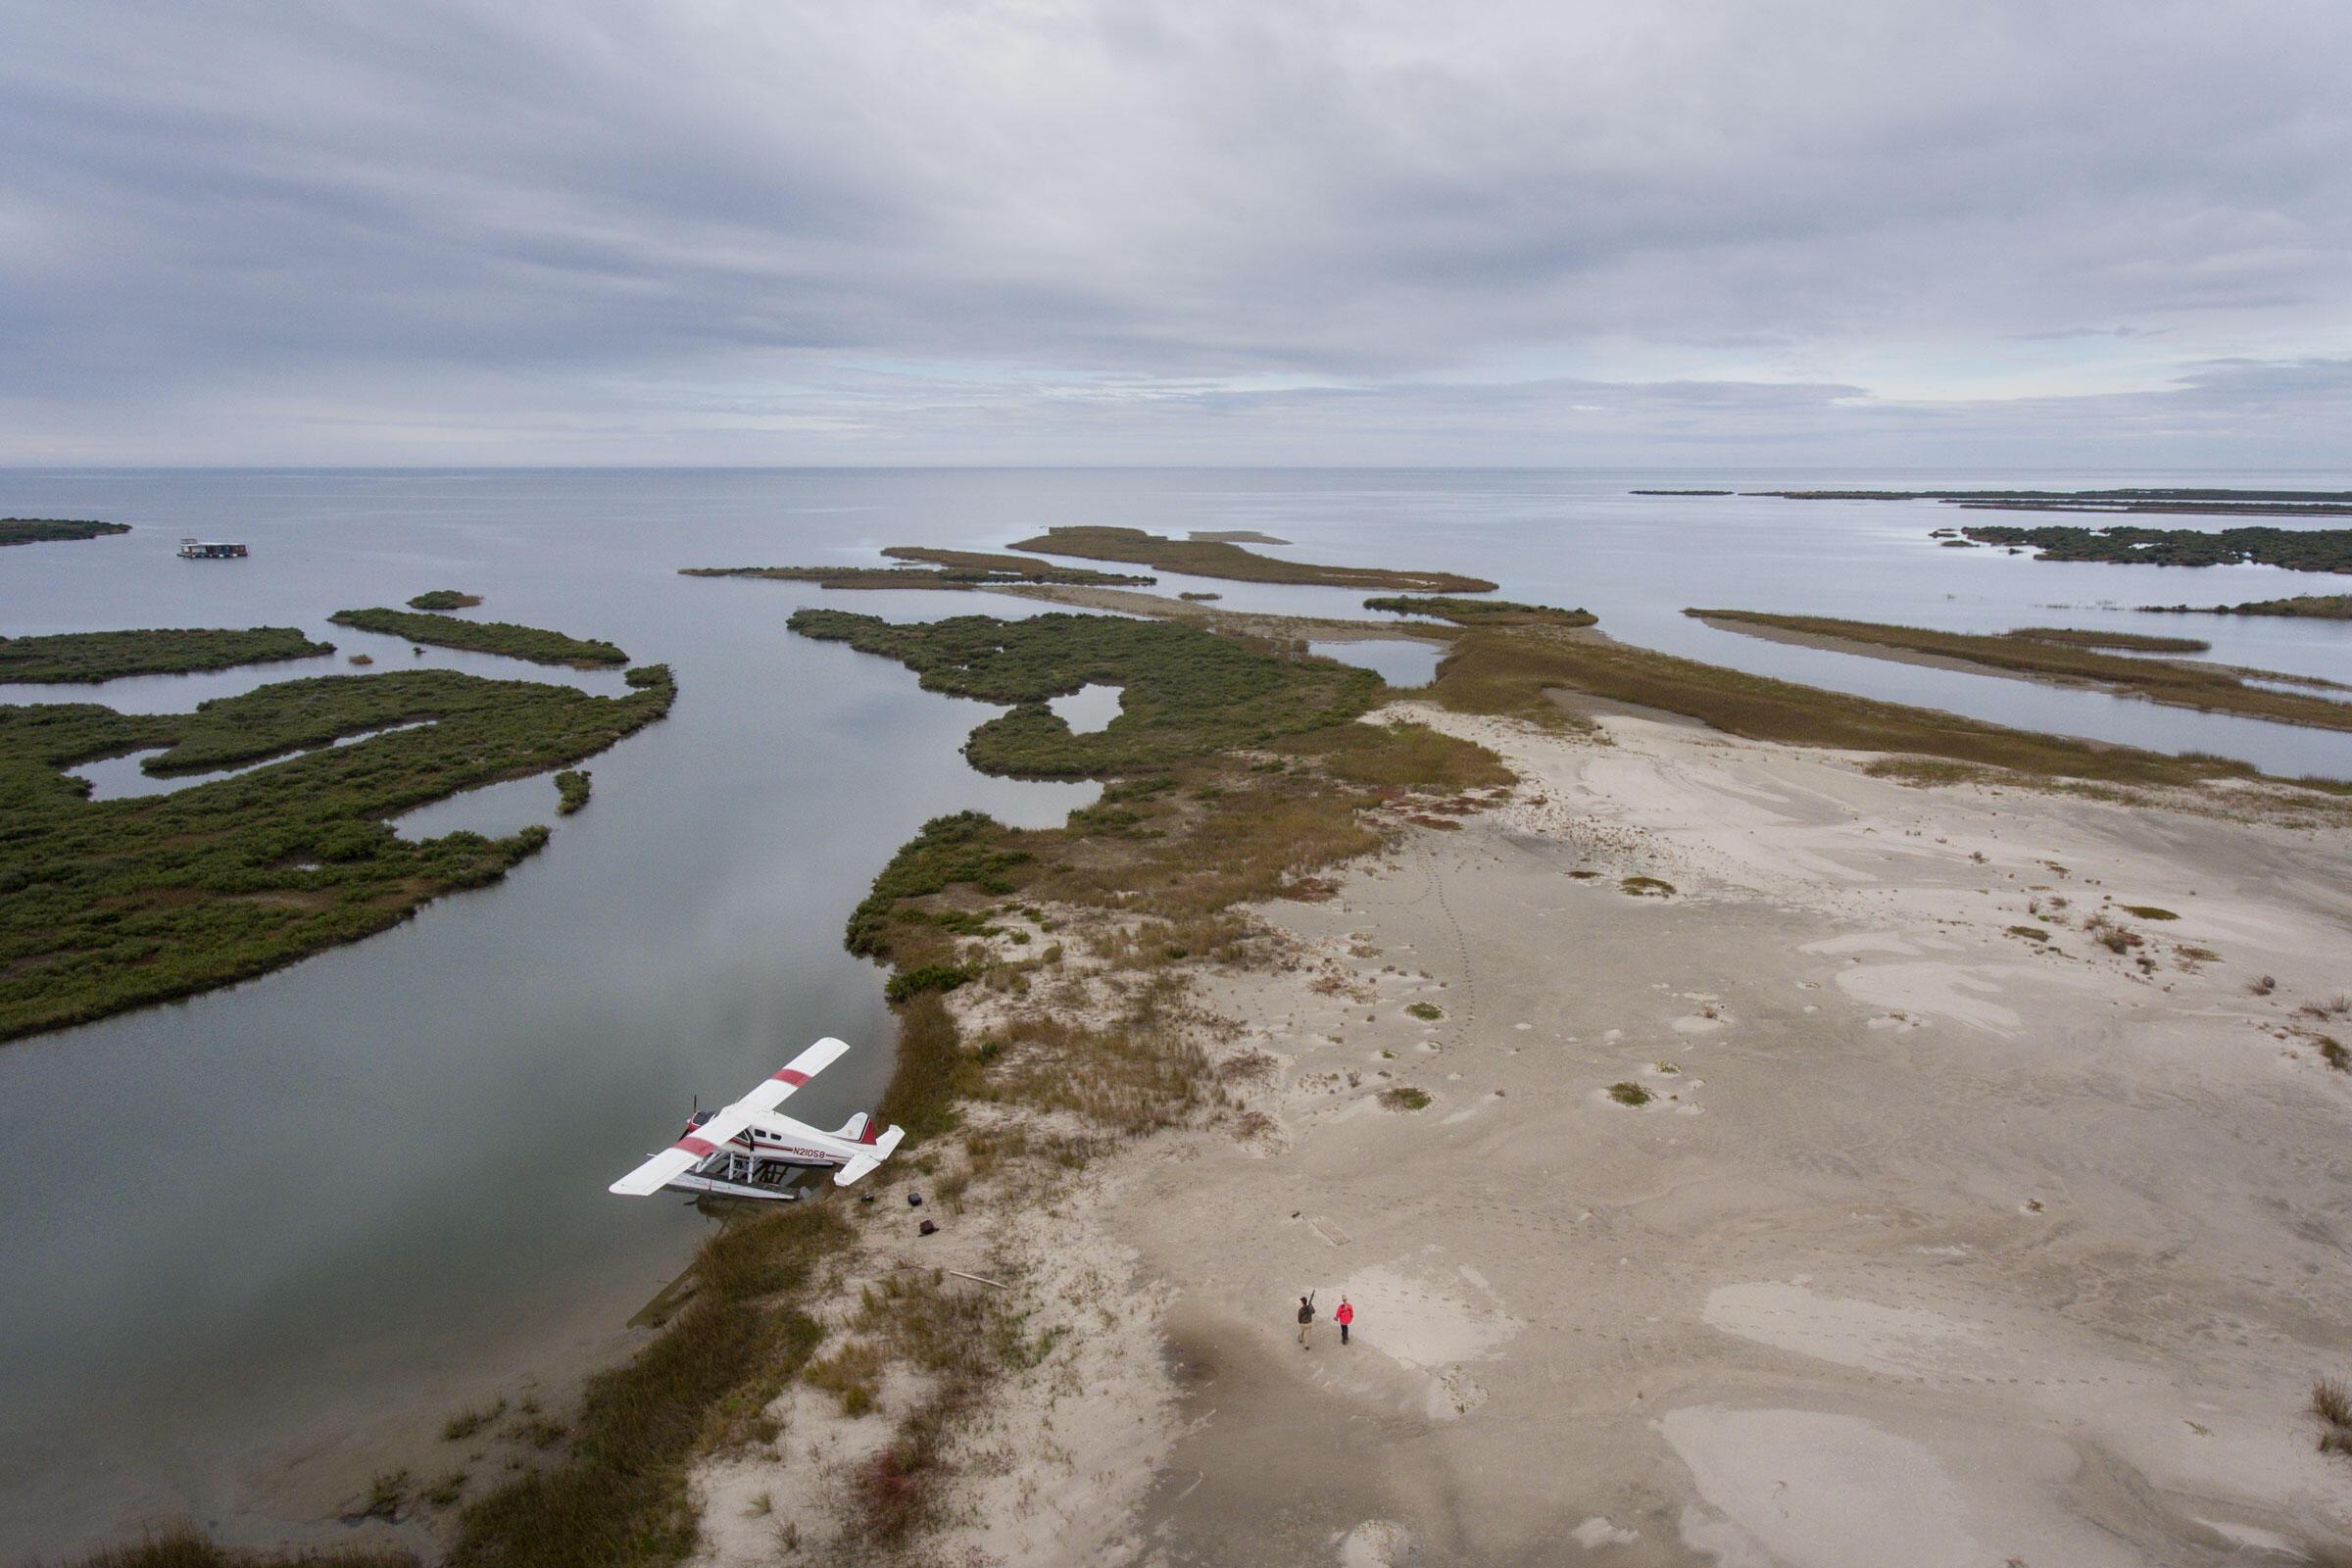 Kara Lankford and Erik Johnson patrol the Chandeleur Islands. Mac Stone